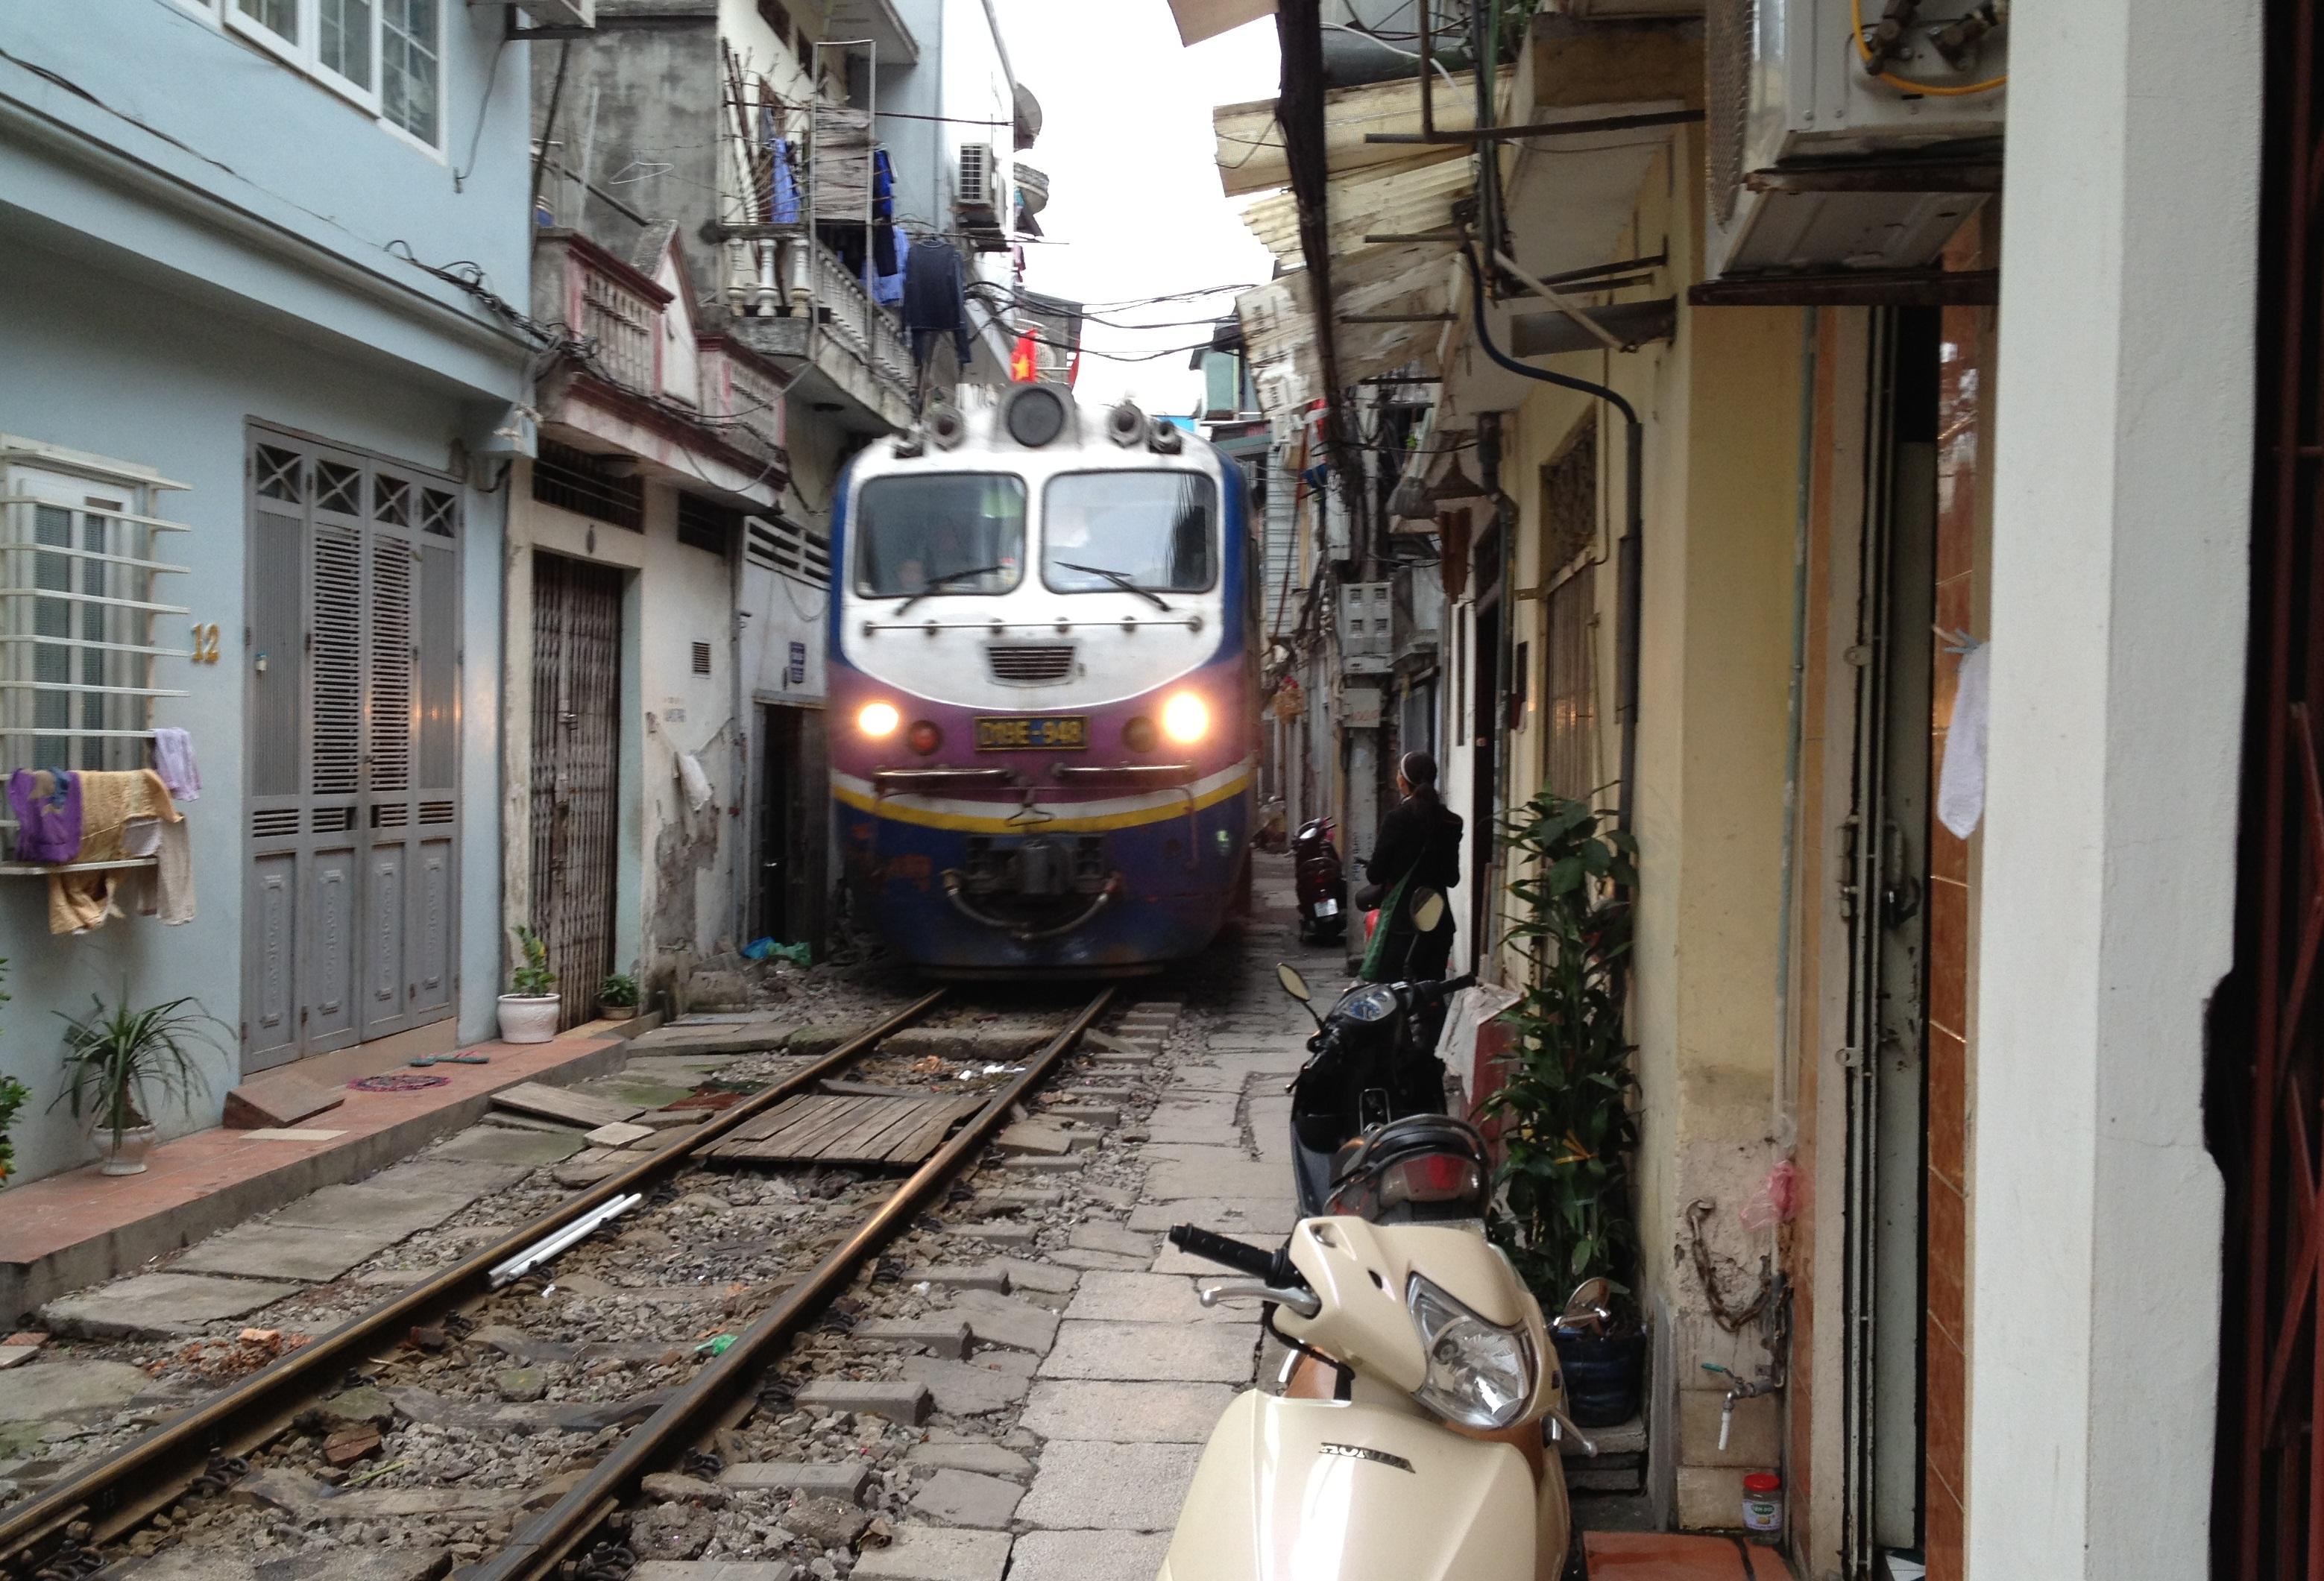 Train hanoi hue voyage en train de nuit horizon for House of tracks